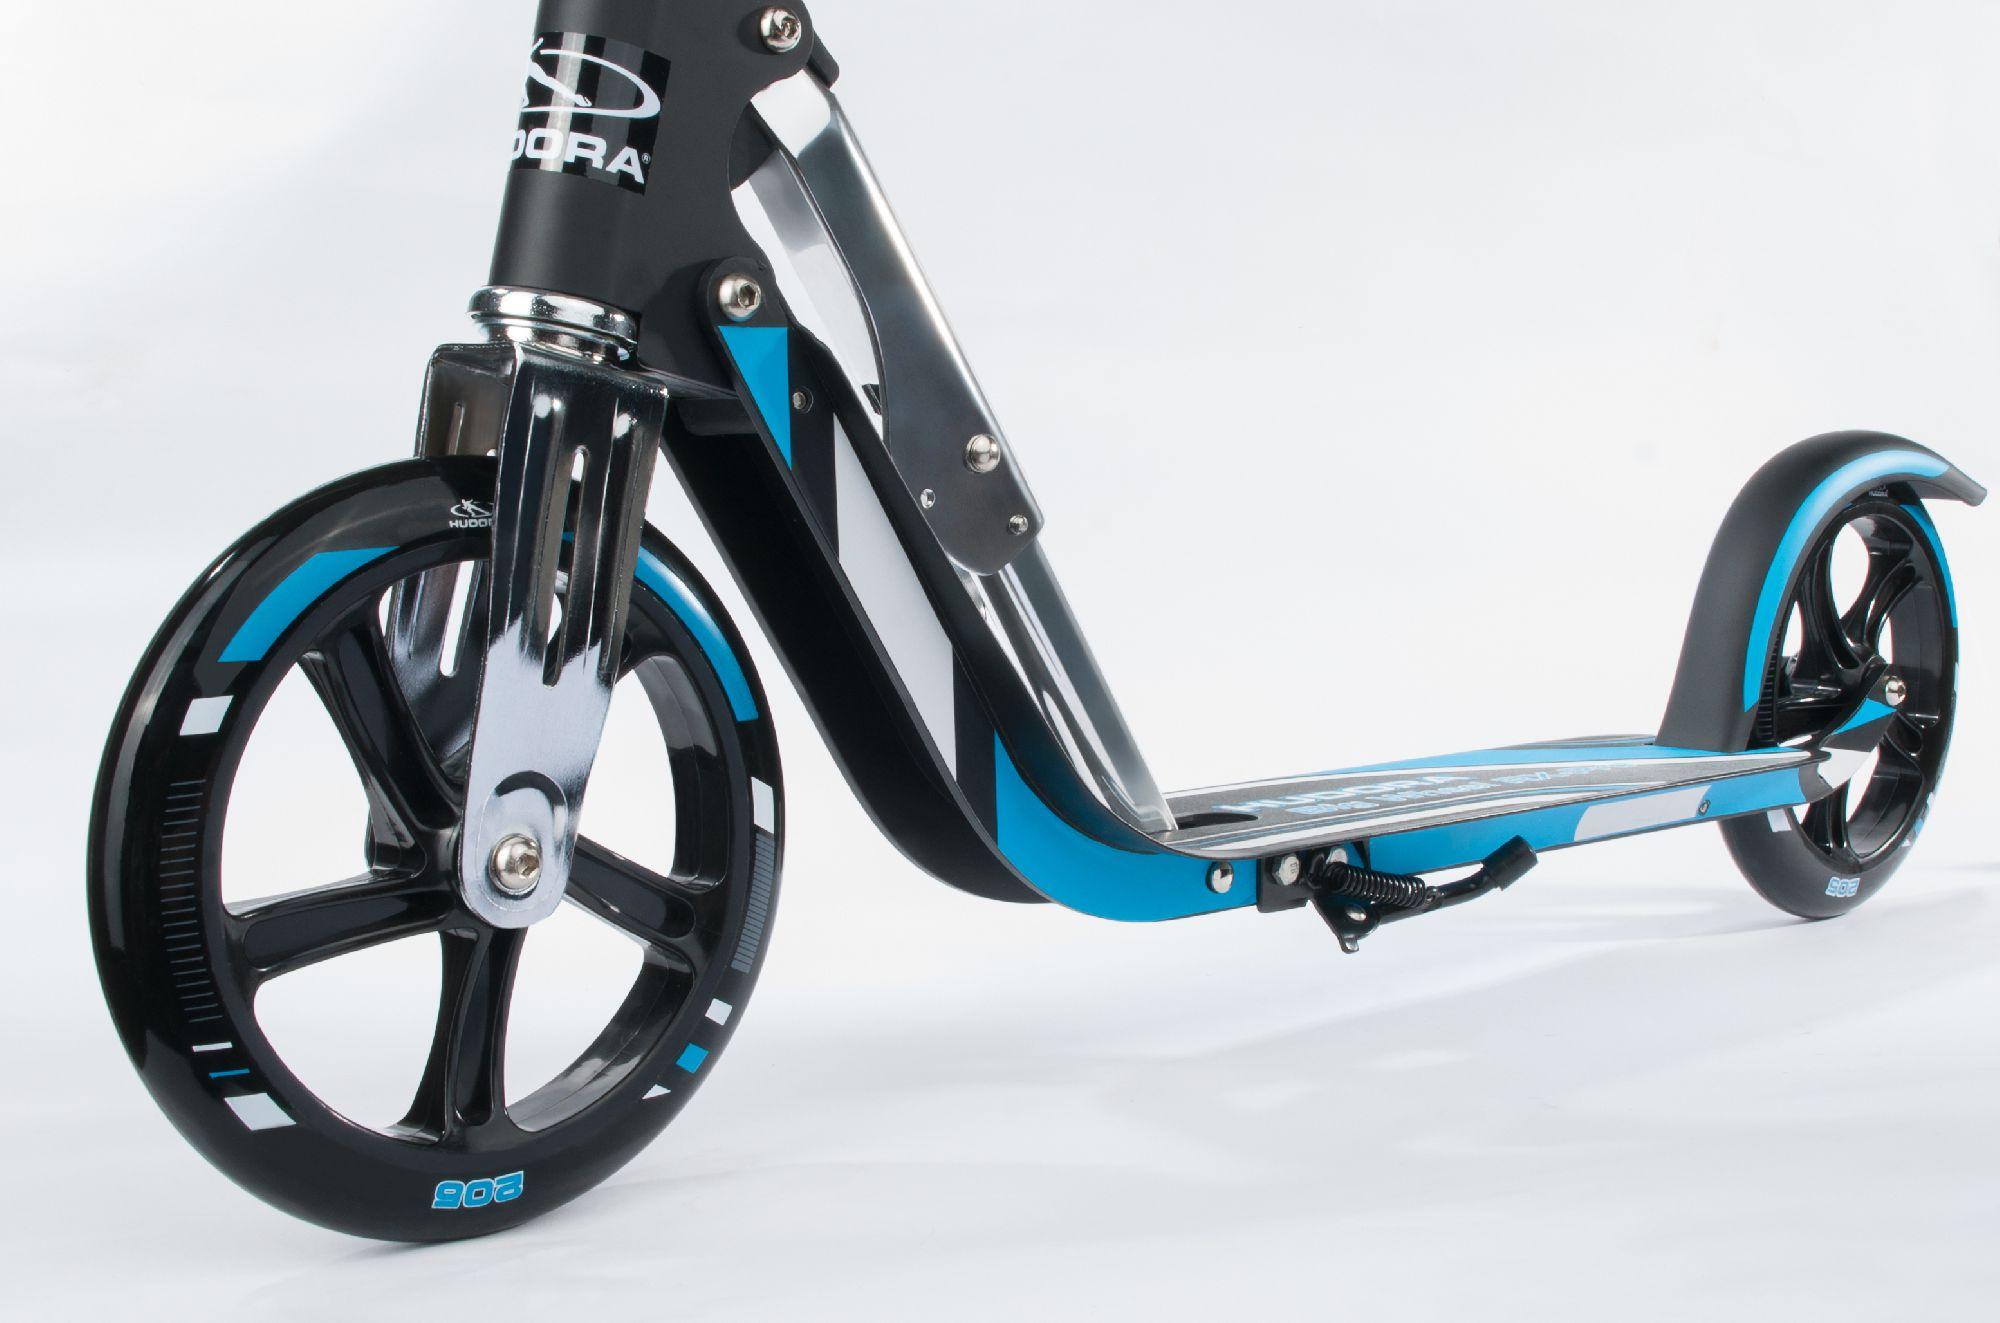 hudora hulajnoga big wheel rx pro 205 niebieska 14709 01 w sklep. Black Bedroom Furniture Sets. Home Design Ideas